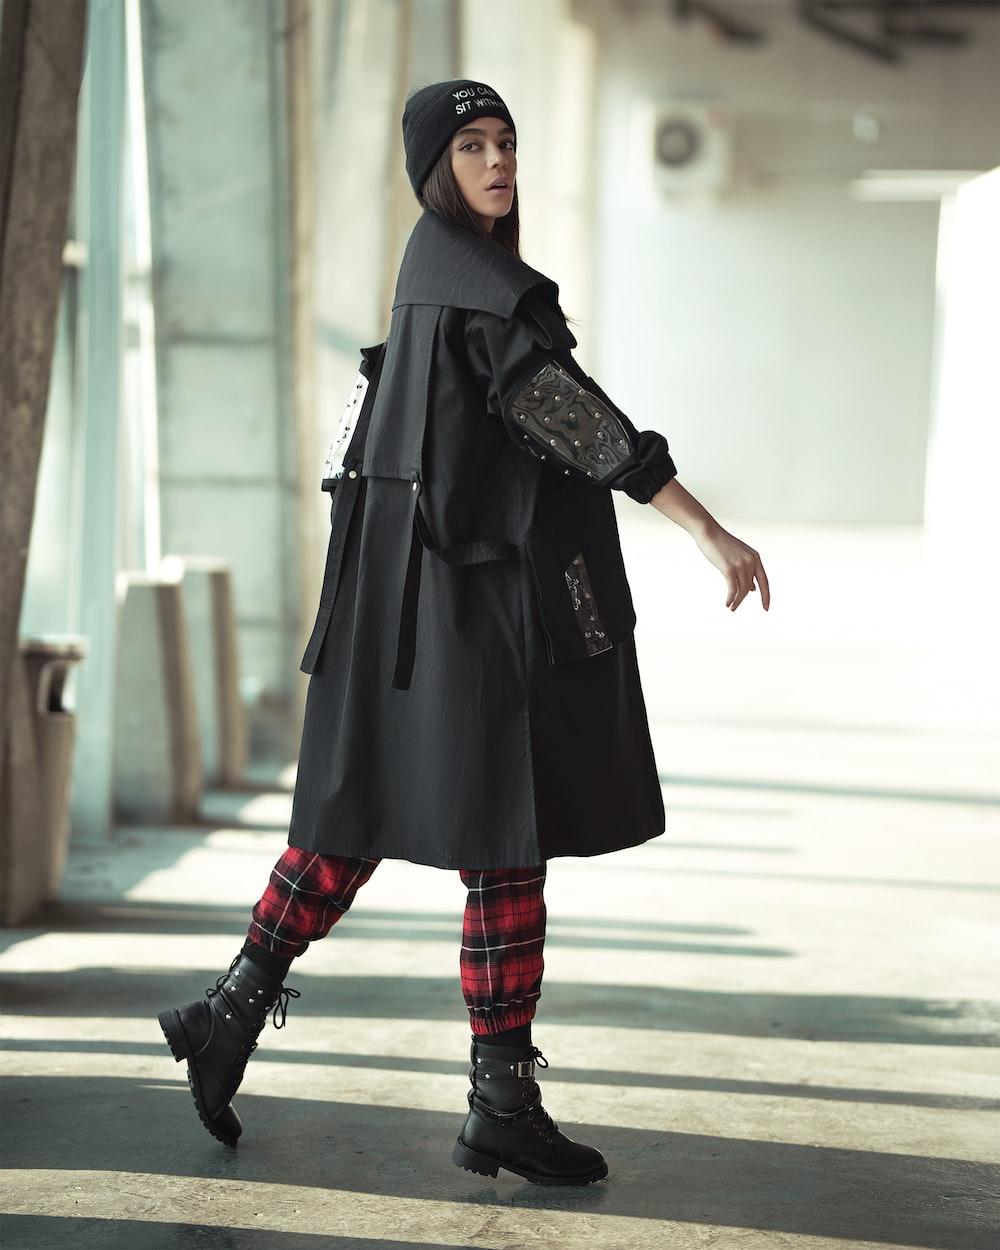 person wearing black coat